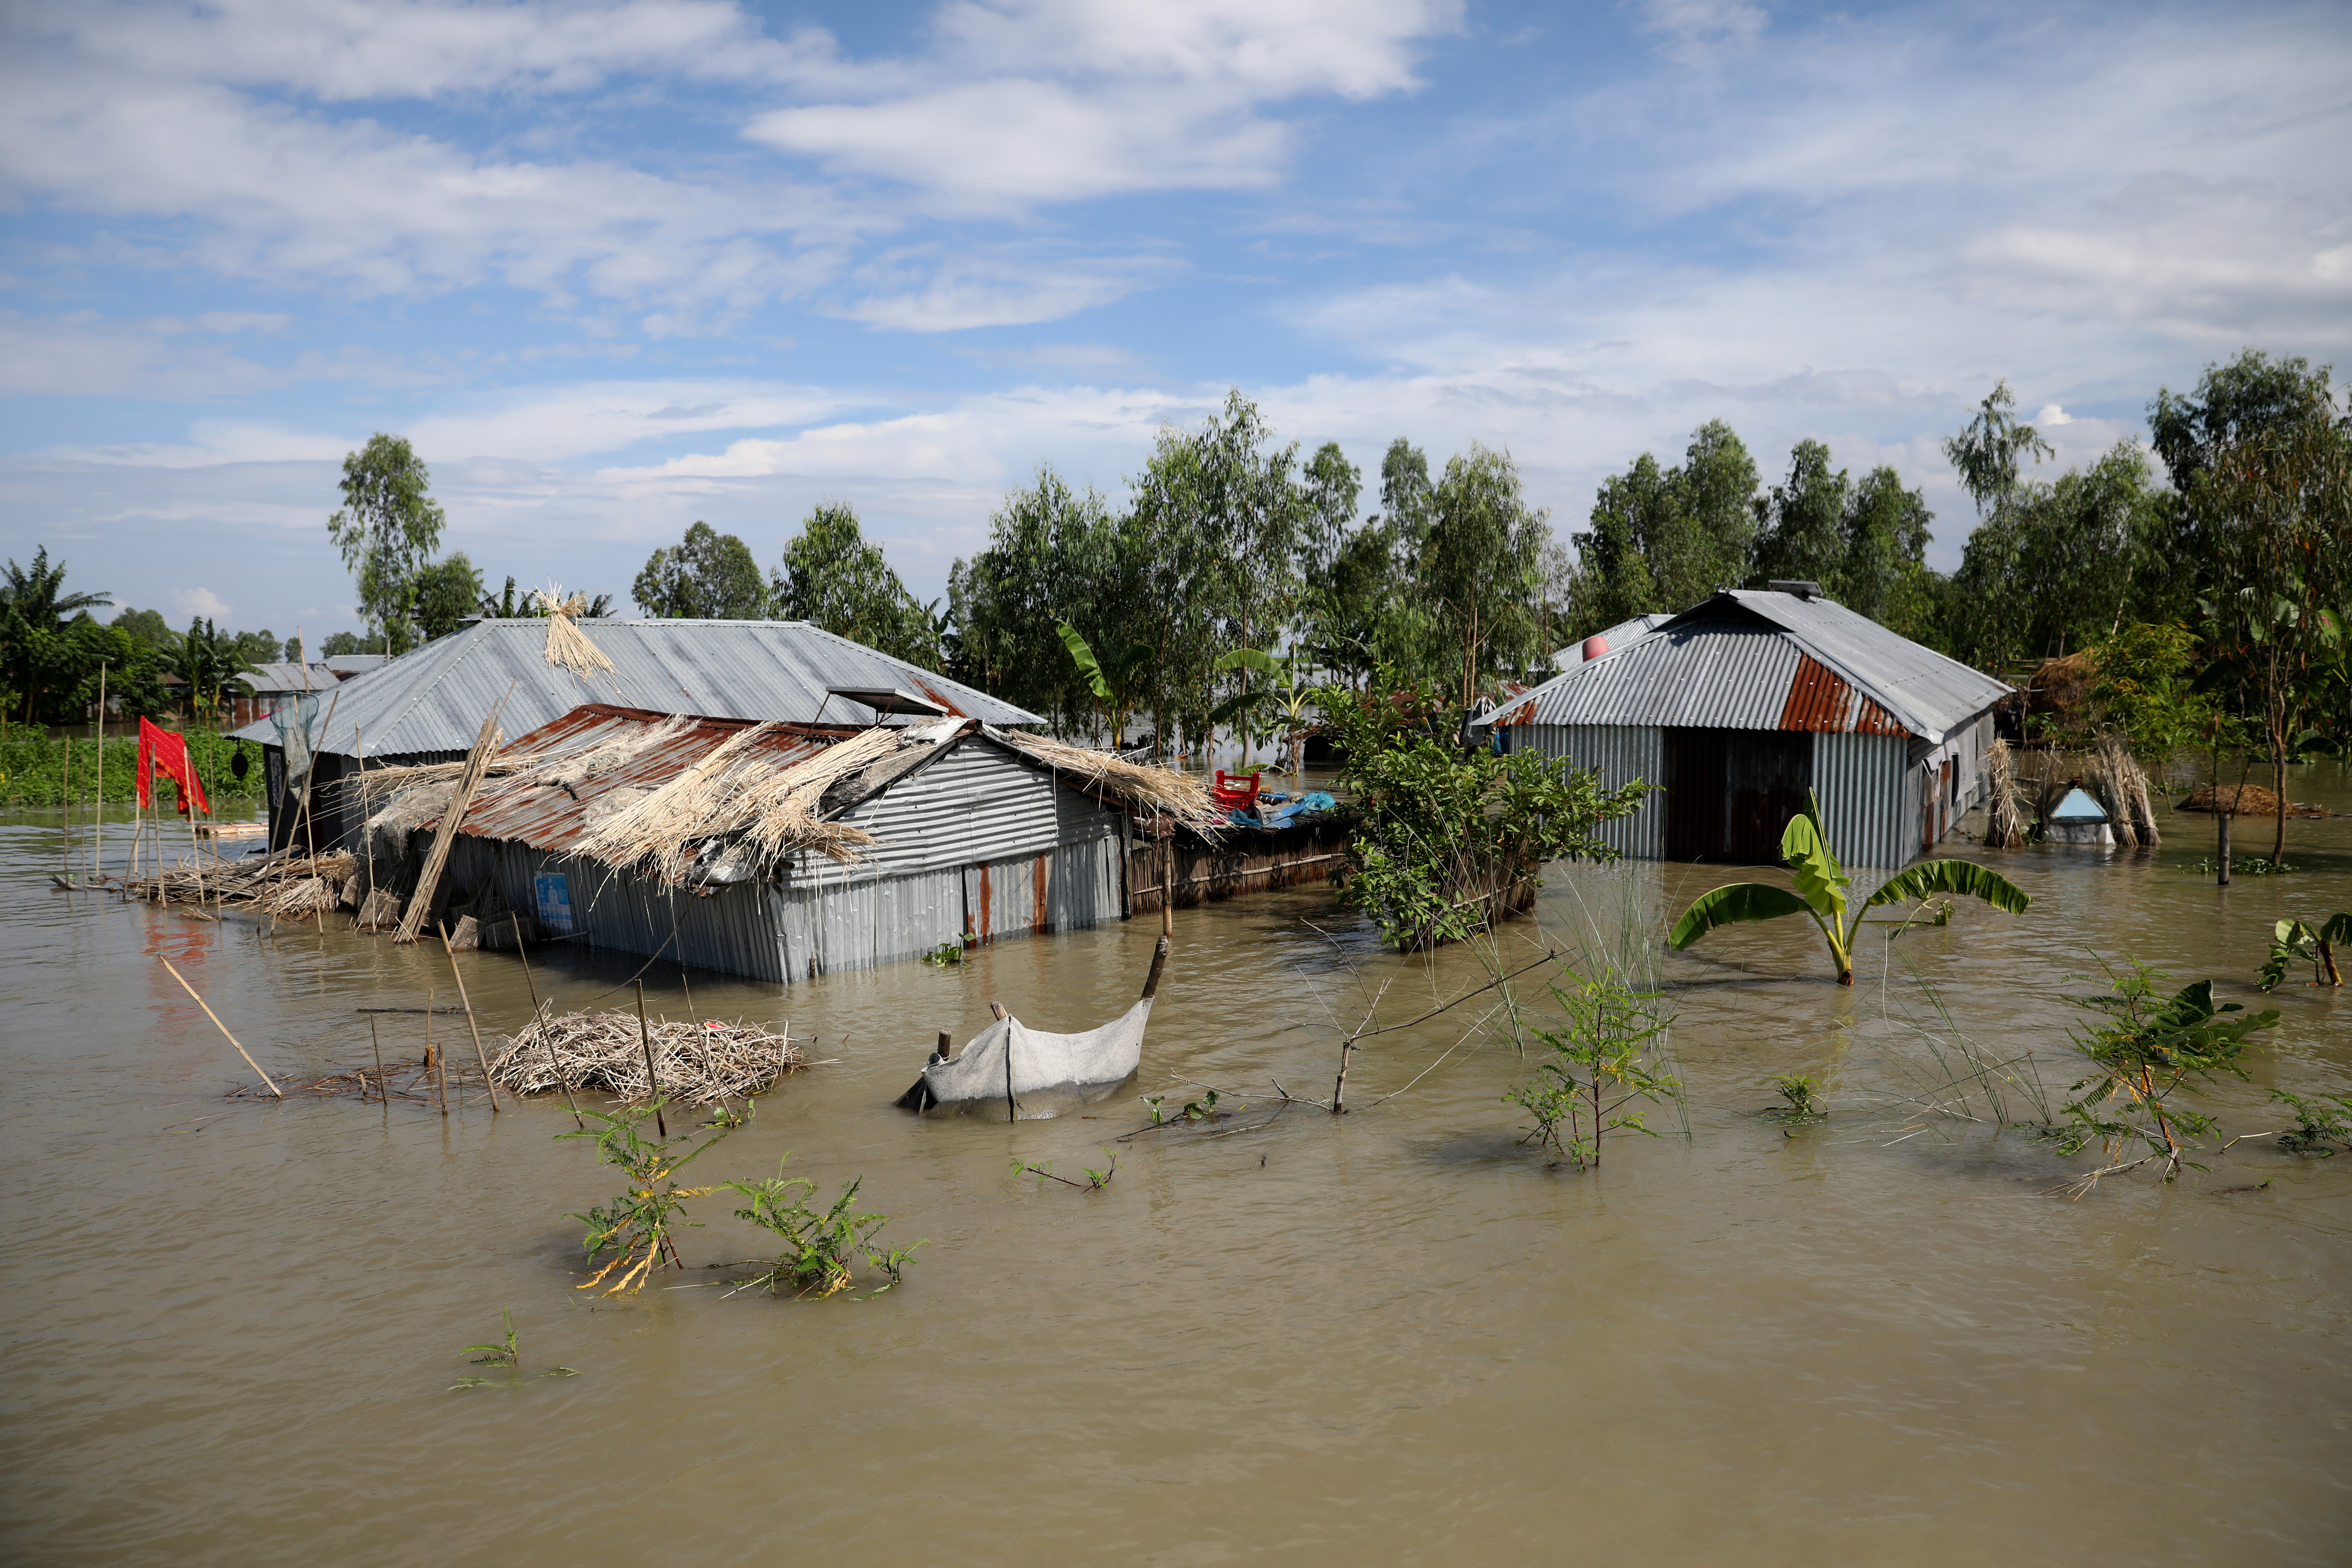 Houses are seen flooded, in Bogura, Bangladesh, July 17, 2020. REUTERS/Mohammad Ponir Hossain - RC25VH9HKV9V